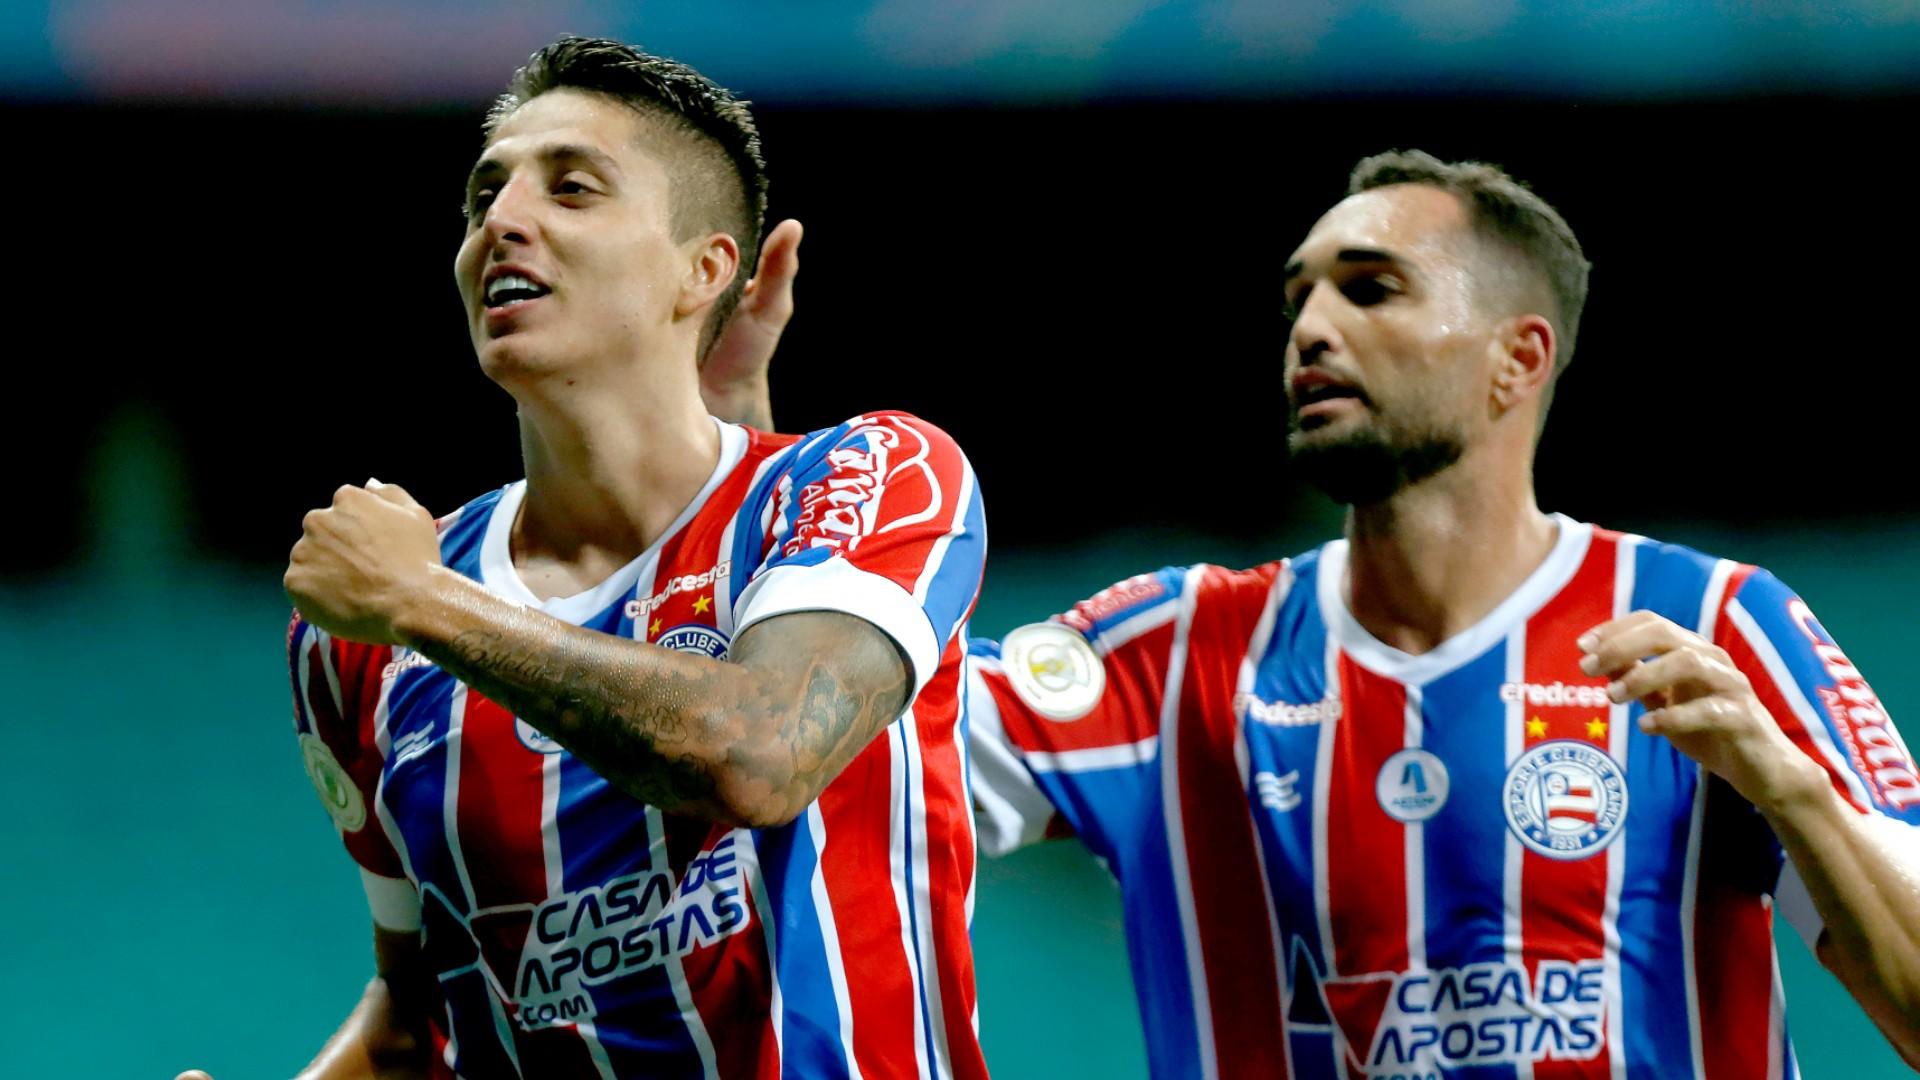 Bahia 2 x 1 Corinthians: Tricolor vence e deixa a zona de rebaixamento | Goal.com